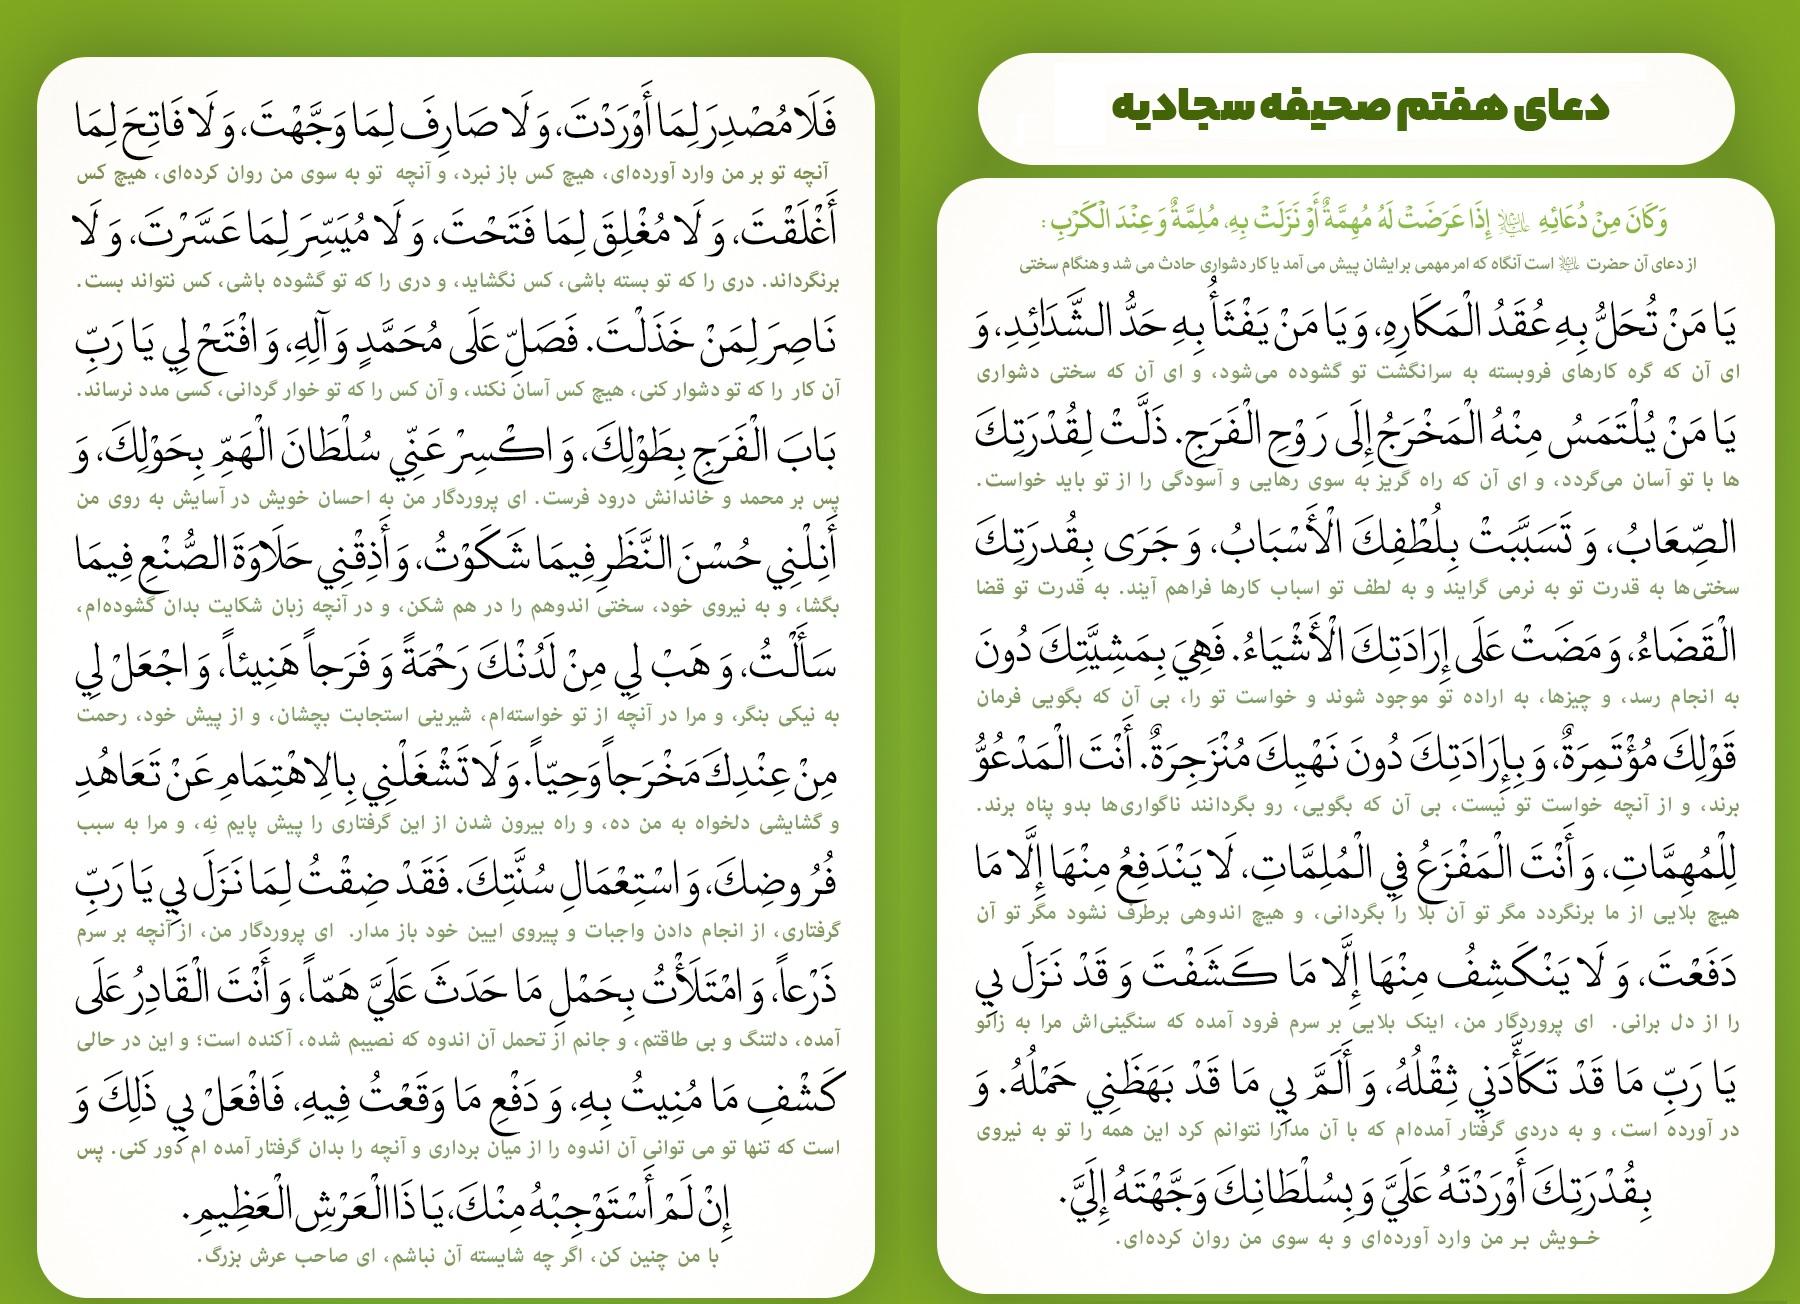 دعای هفتم صحیفه